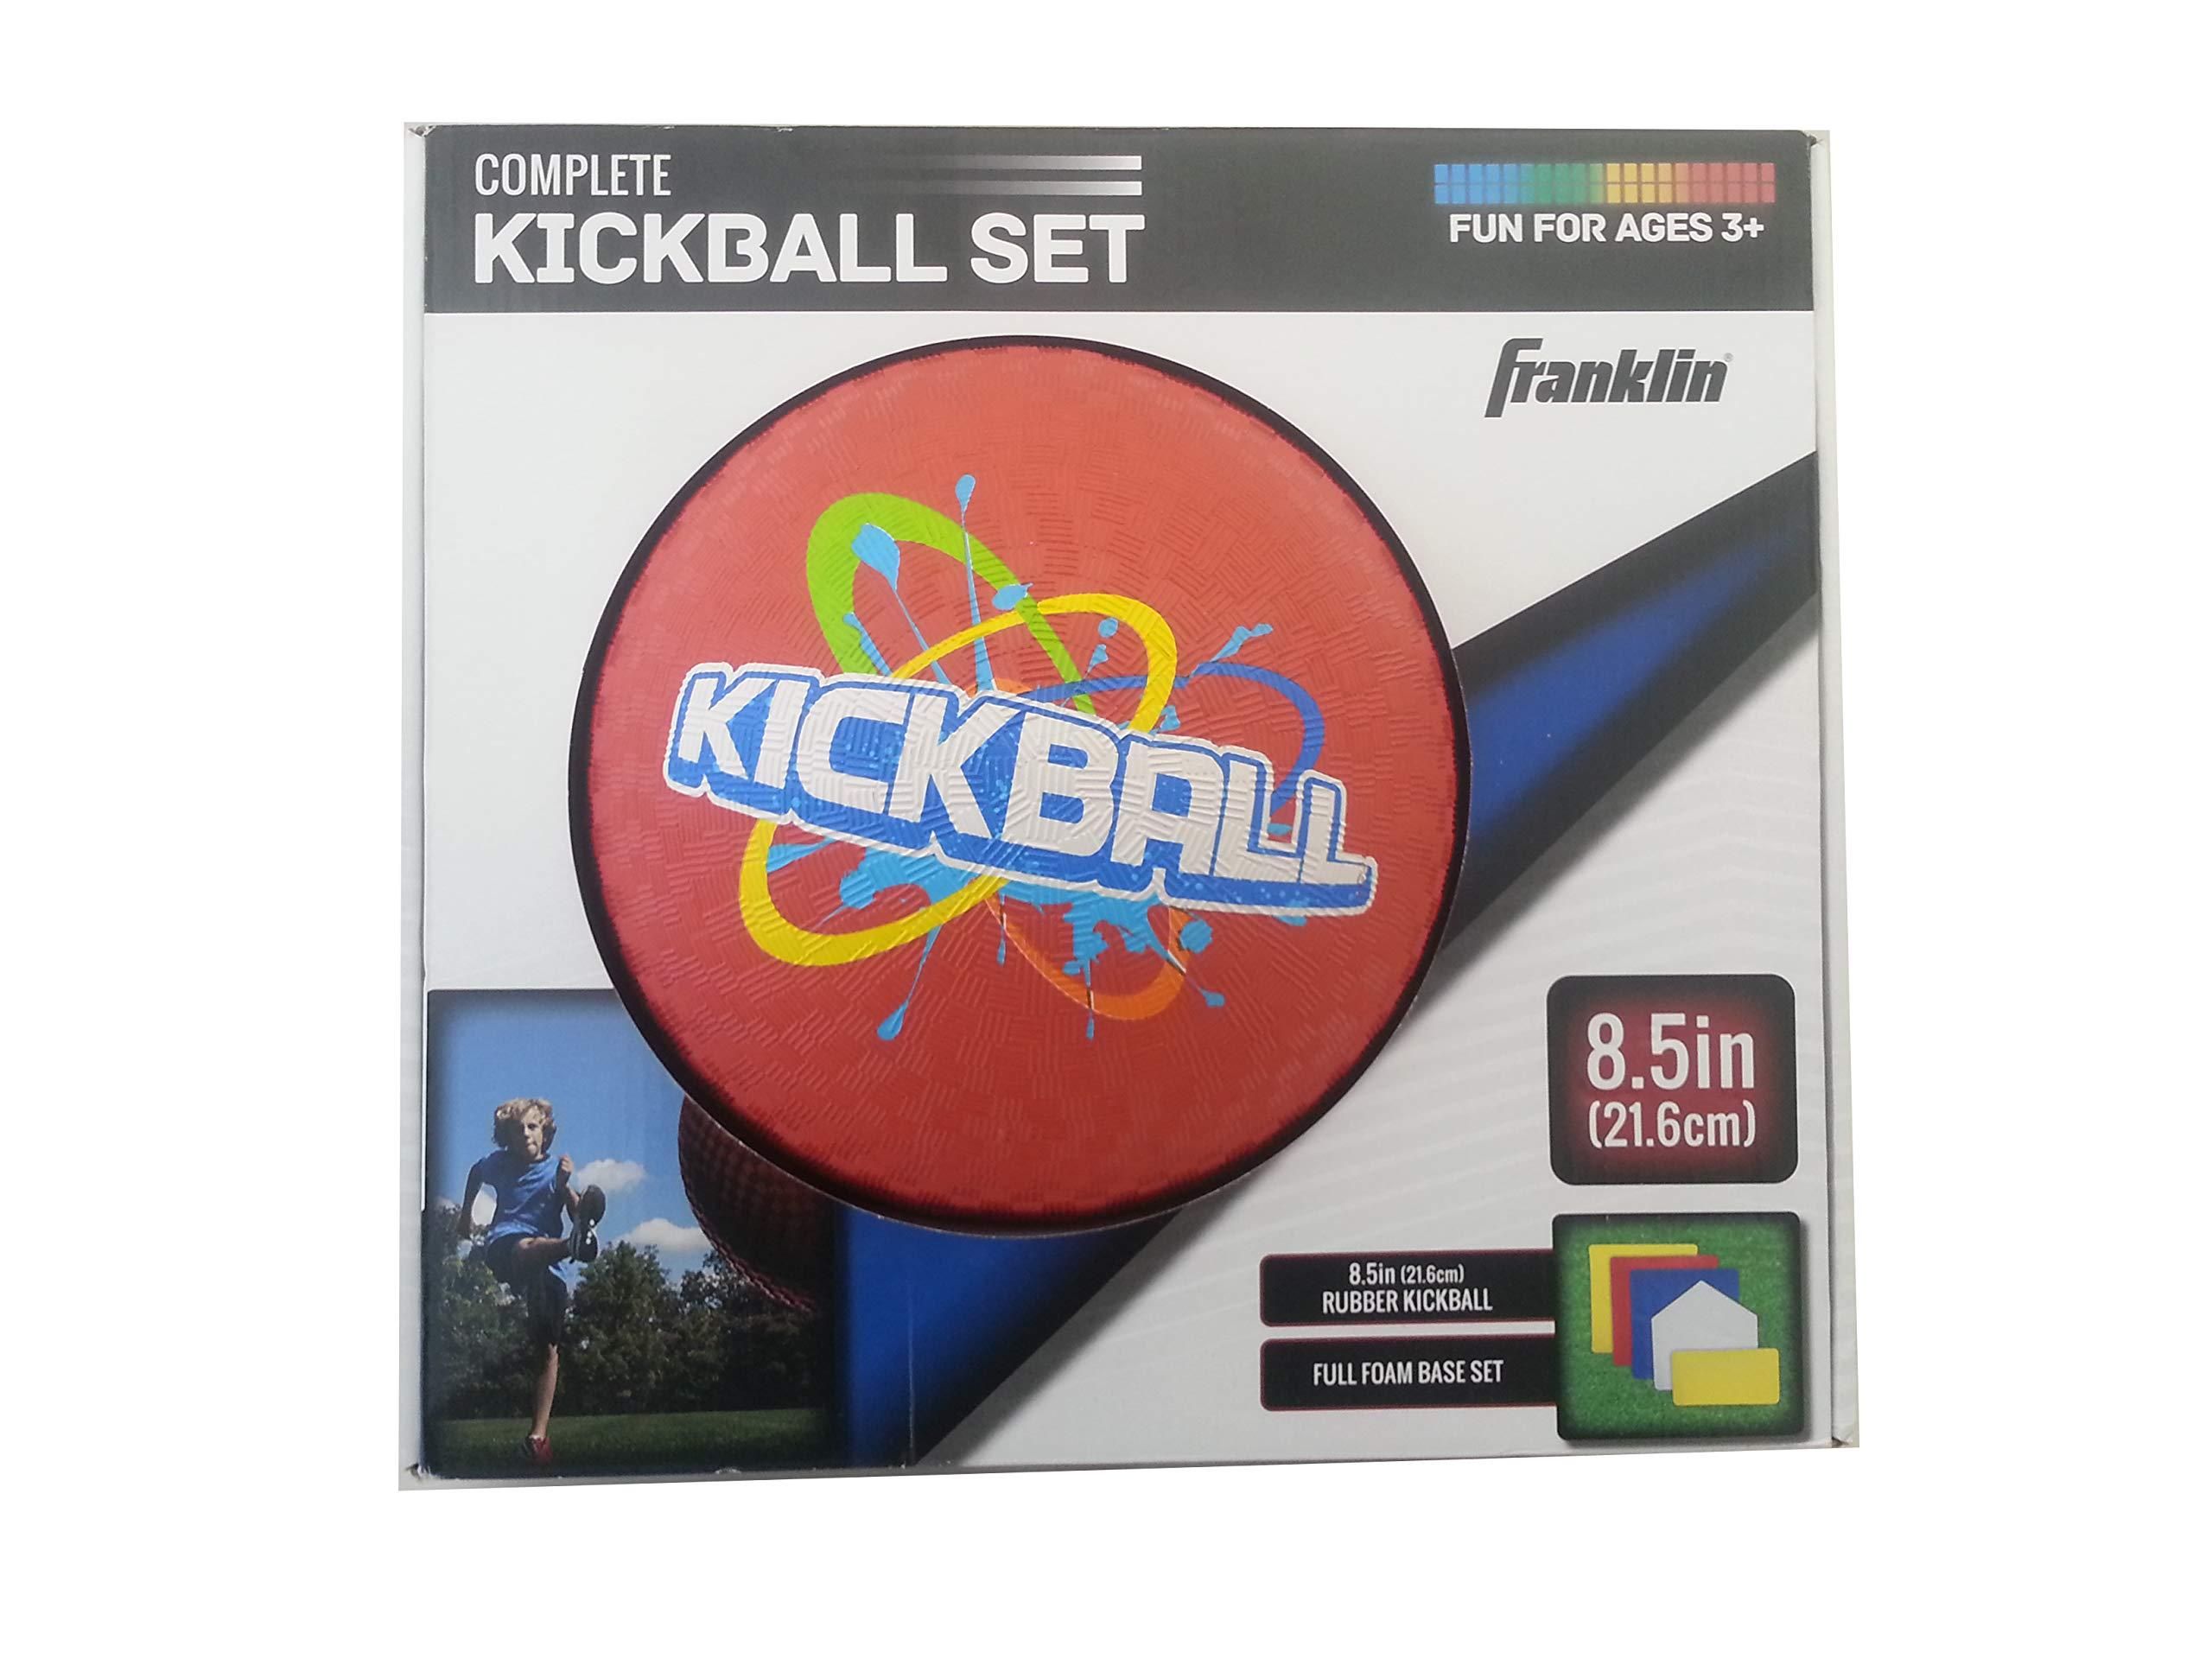 Franklin Complete Kickball Set 8.5'' Ball with Full Foam Bases